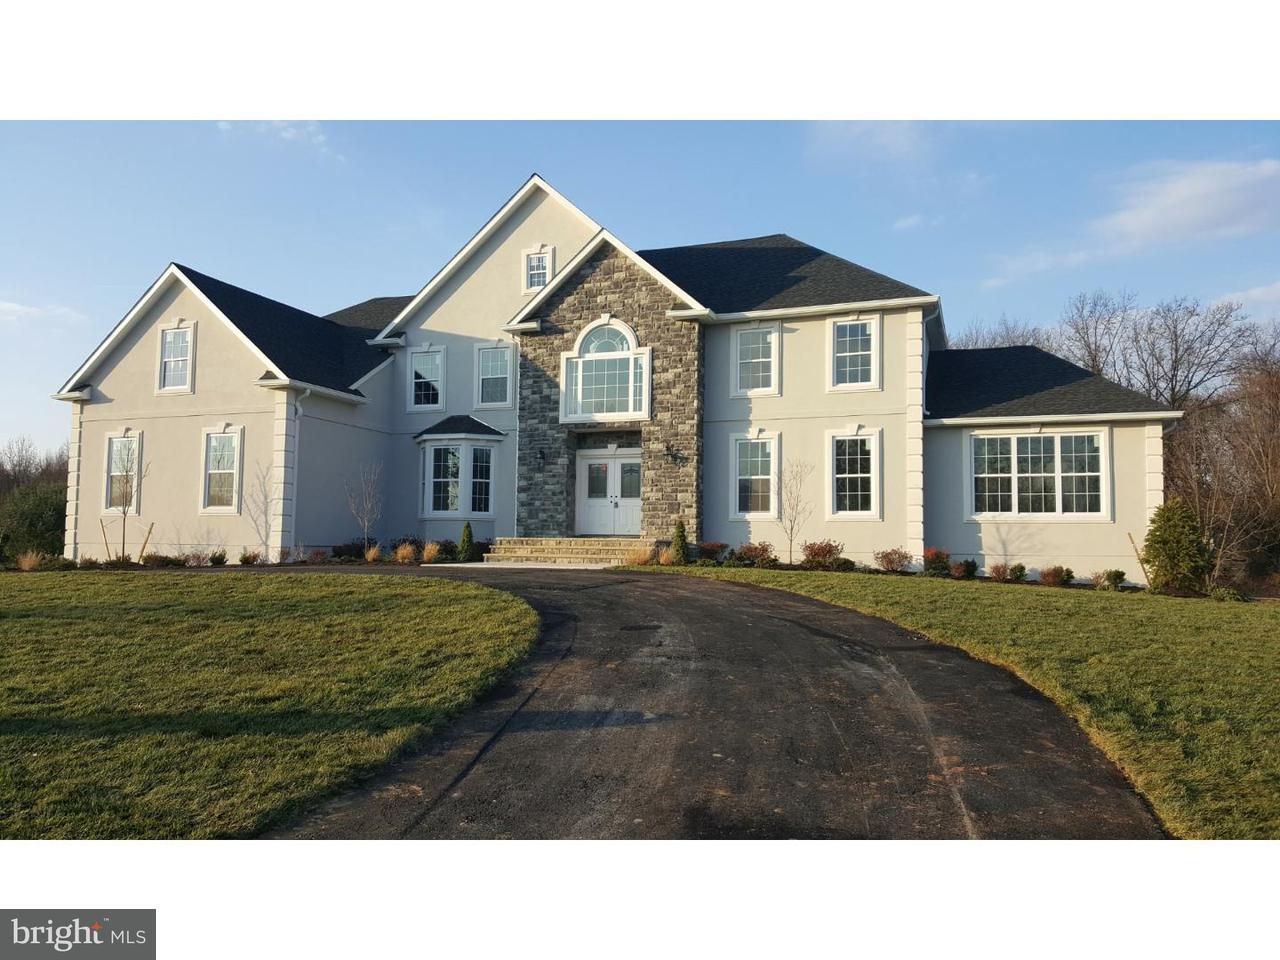 Casa Unifamiliar por un Venta en 4 HELEN Court Monroe, Nueva Jersey 08831 Estados UnidosEn/Alrededor: Monroe Township